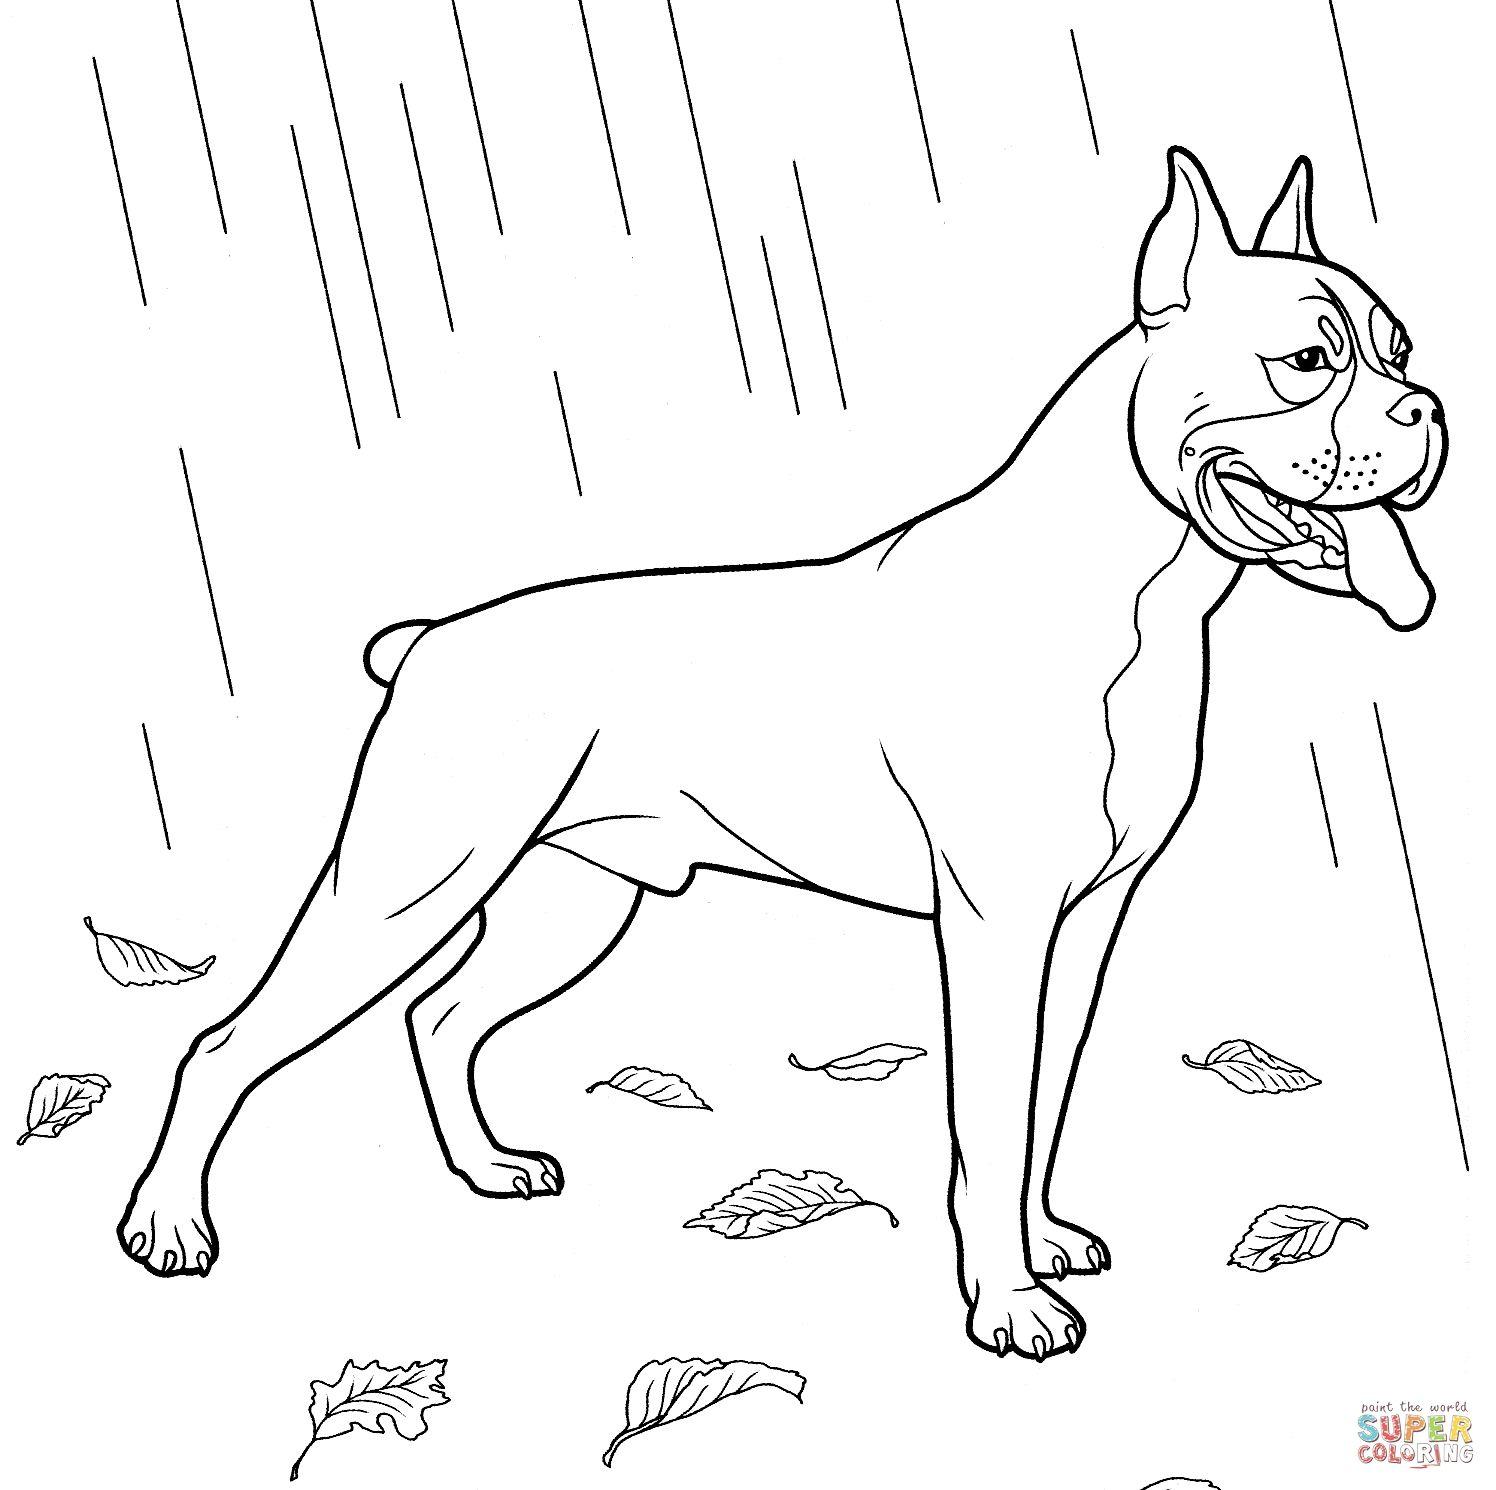 Dog Coloring Pages | Forcoloringpages.com | PSI | Pinterest